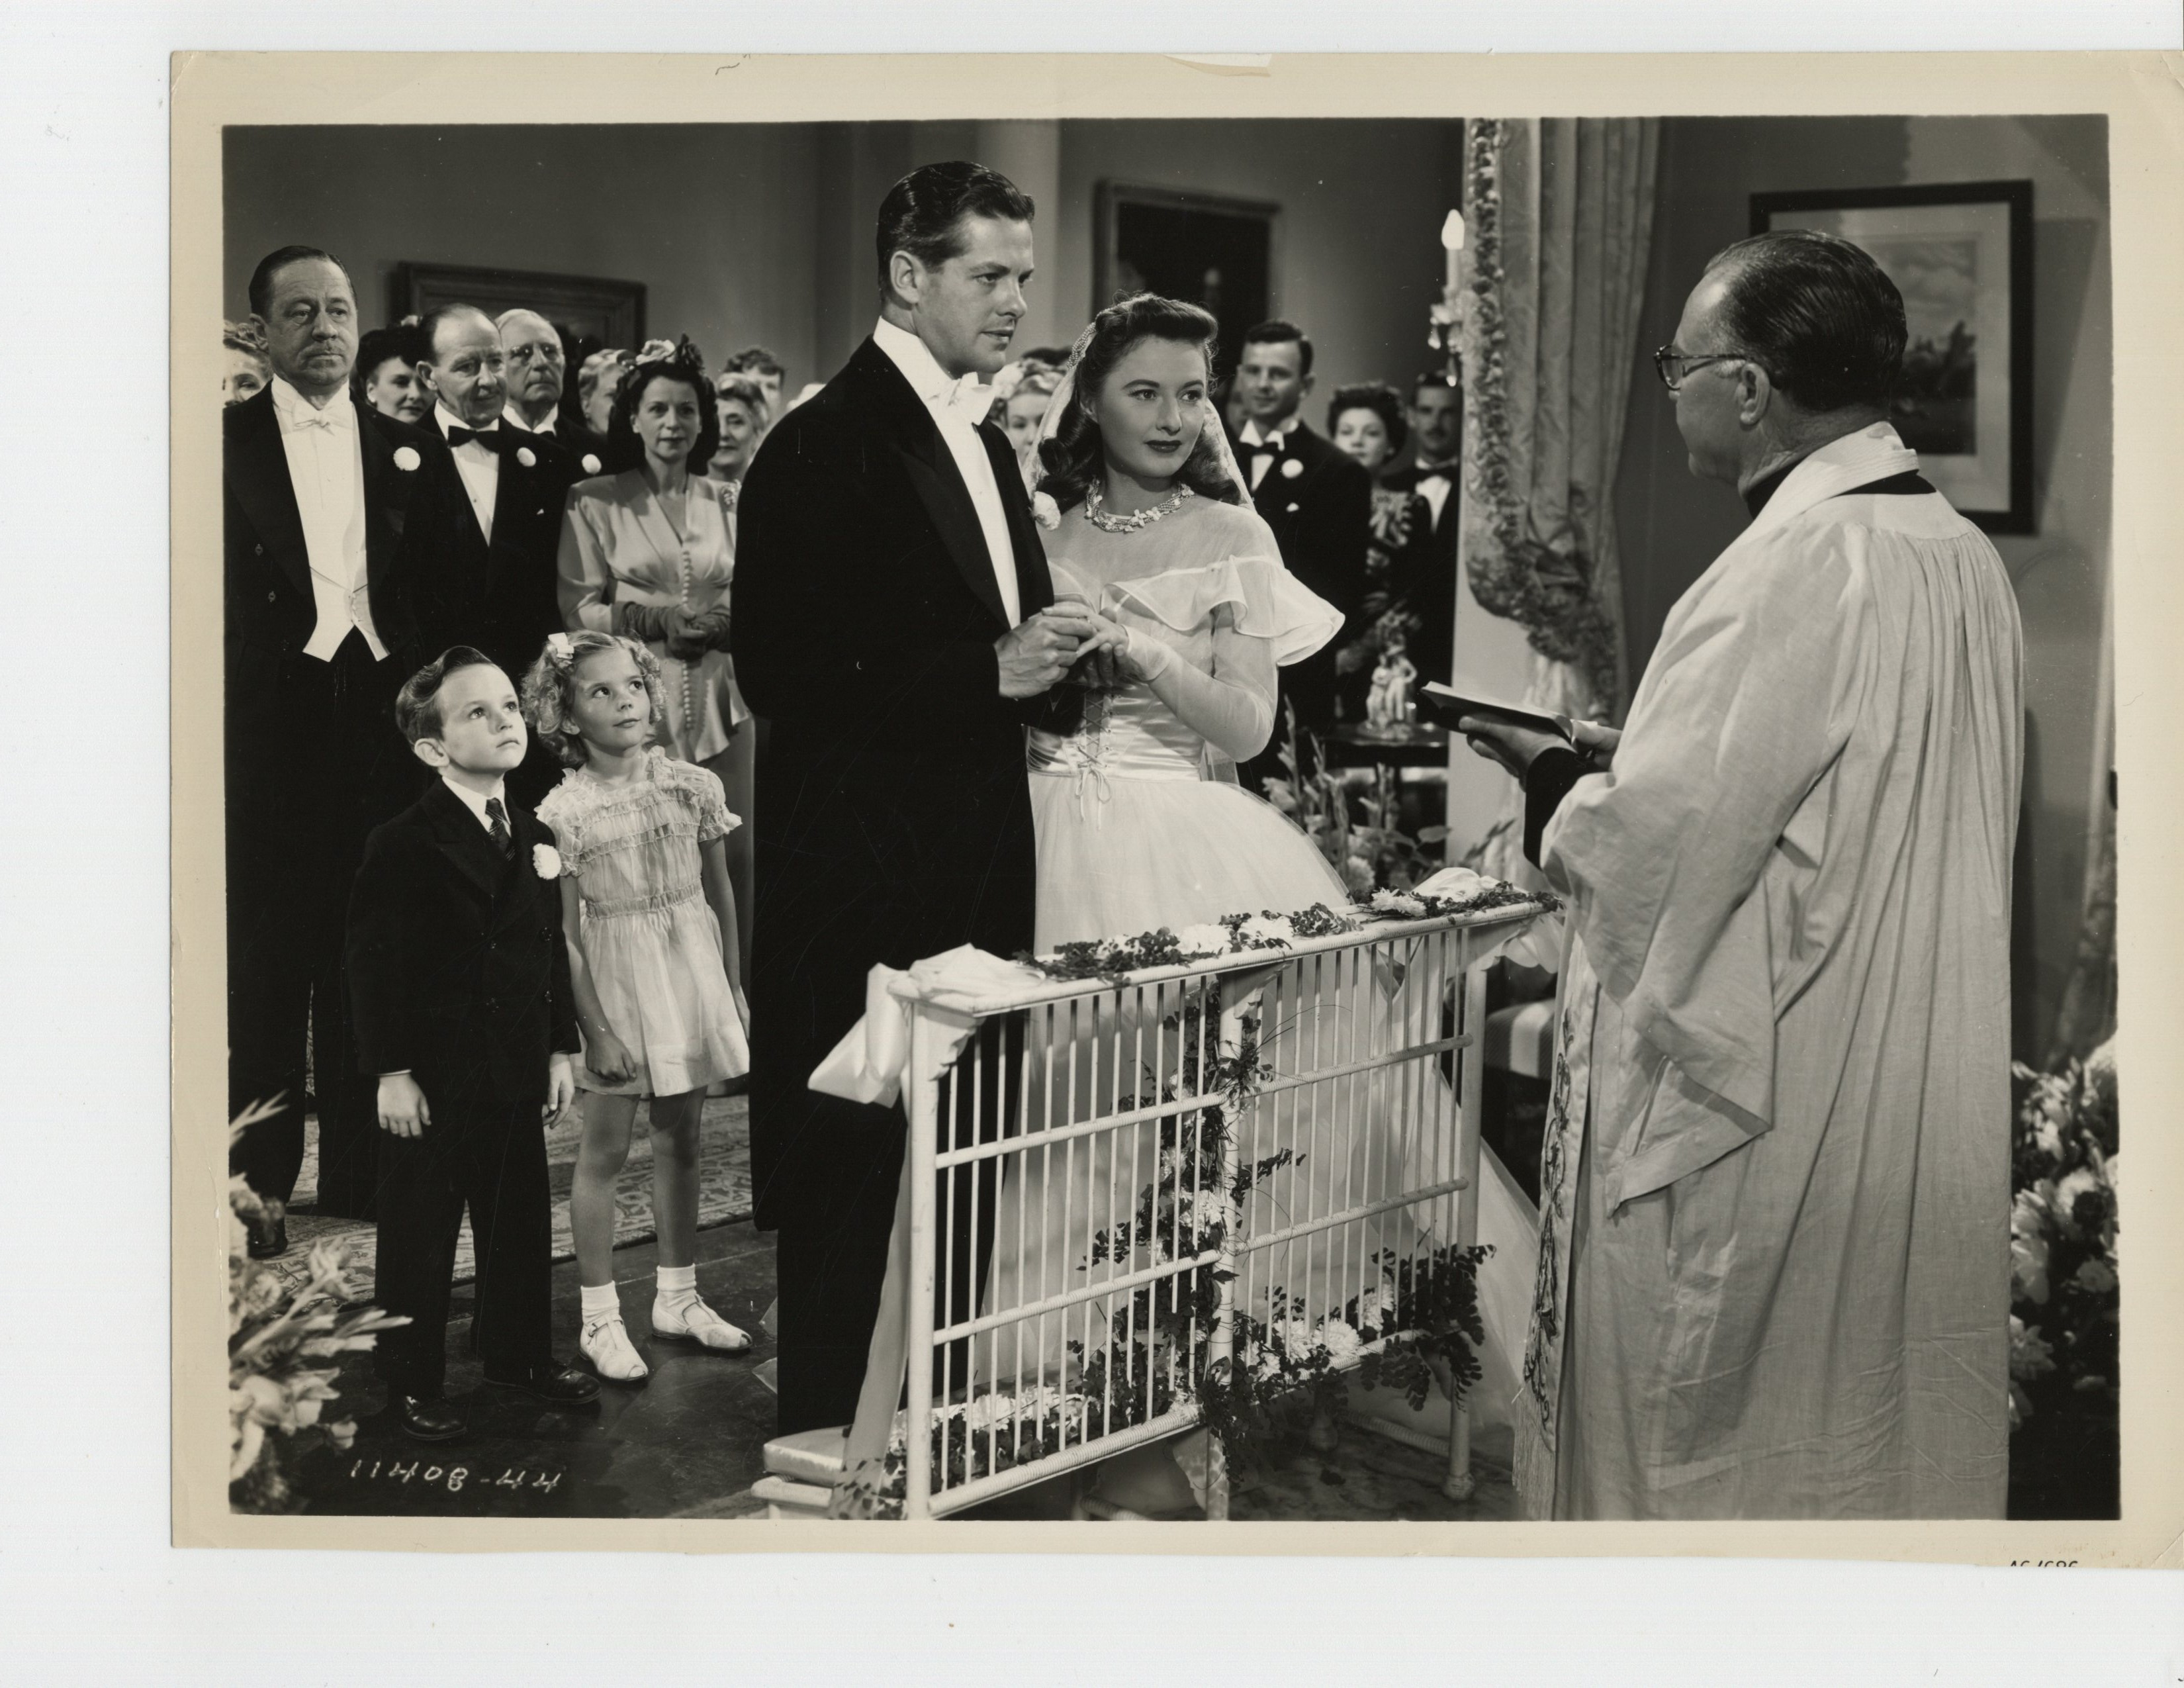 Natalie Wood, Barbara Stanwyck, Robert Benchley, Robert Cummings, and Harry Hayden in The Bride Wore Boots (1946)